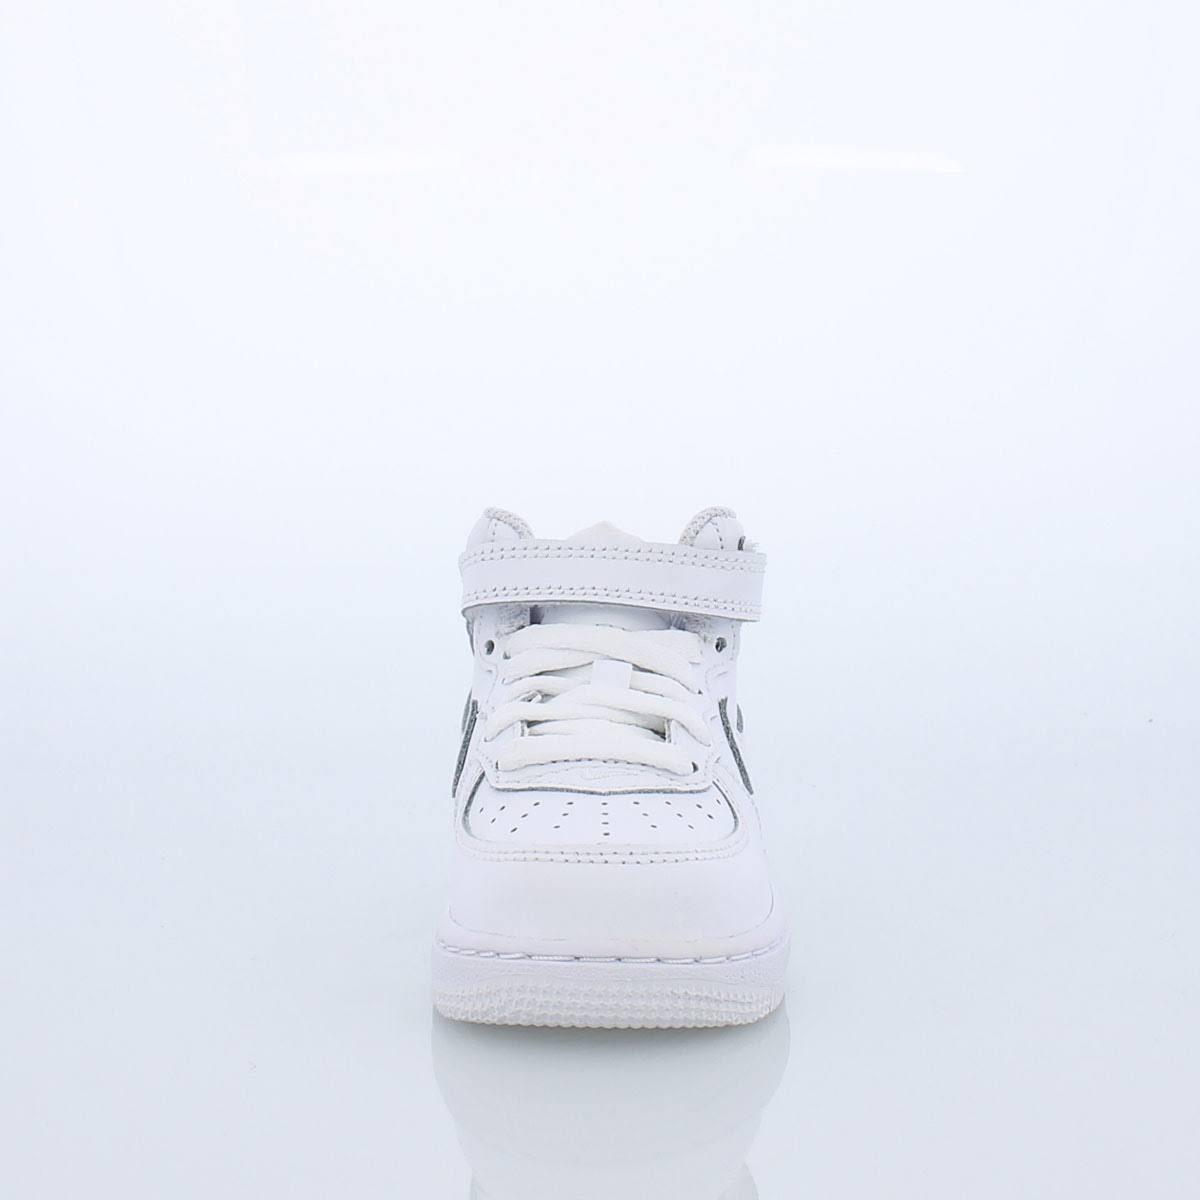 314197113 Calzado Niños Tamaño Para 1 Nike 2 Mid Pequeños Force Air wnq77I68